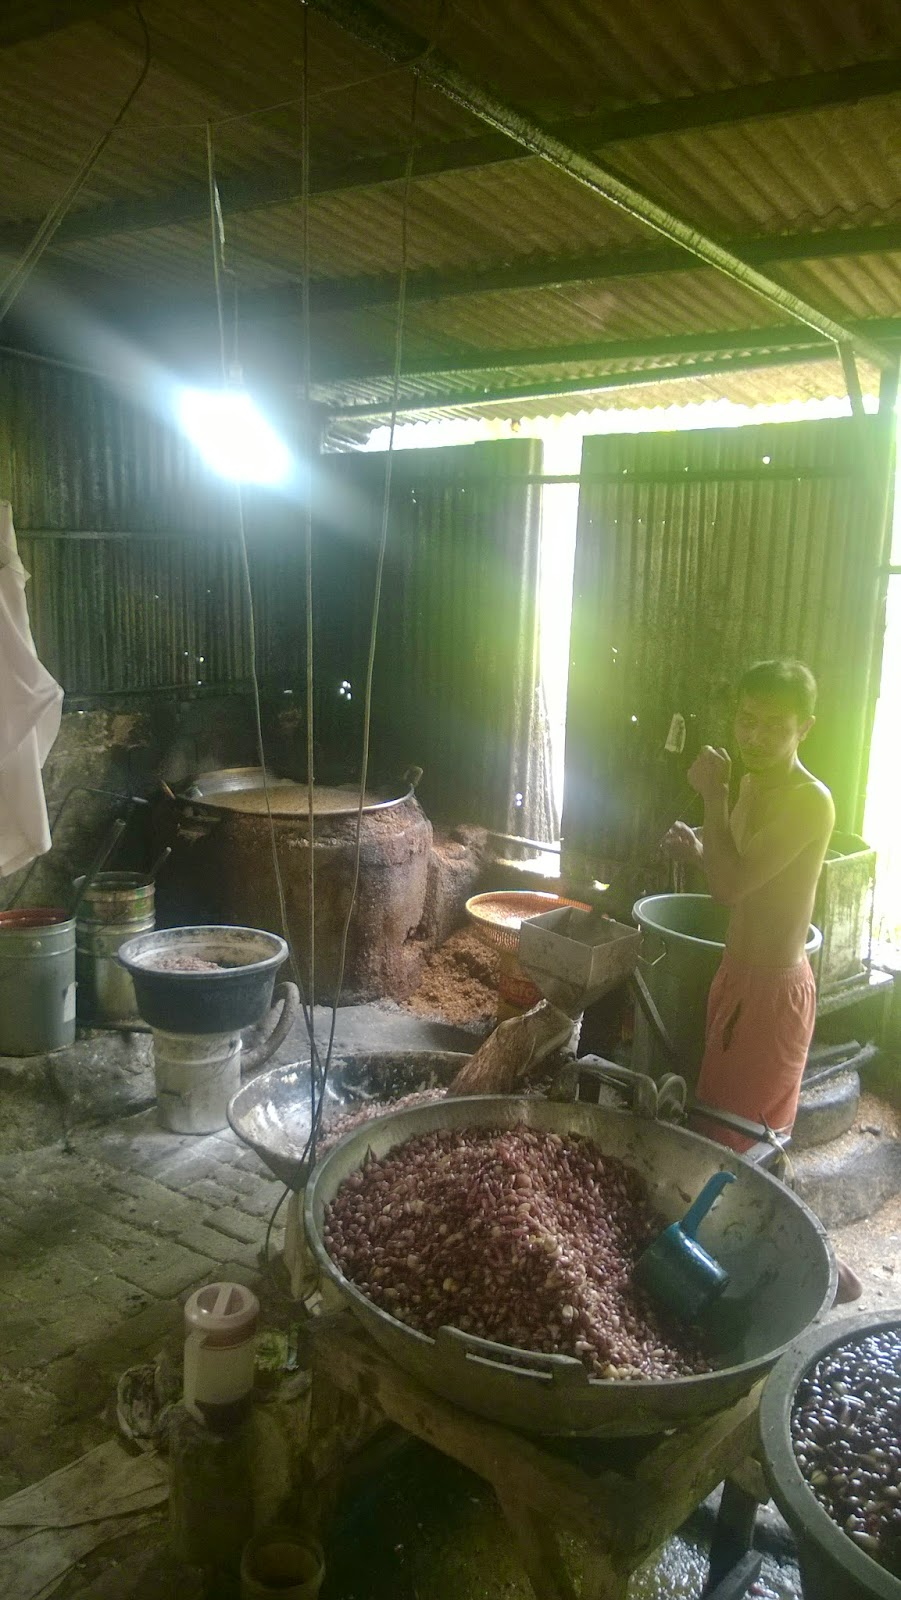 Pabrik bawang goreng, bawang goreng, jual bawang goreng, bawang goreng brebes, suplier bawang goreng